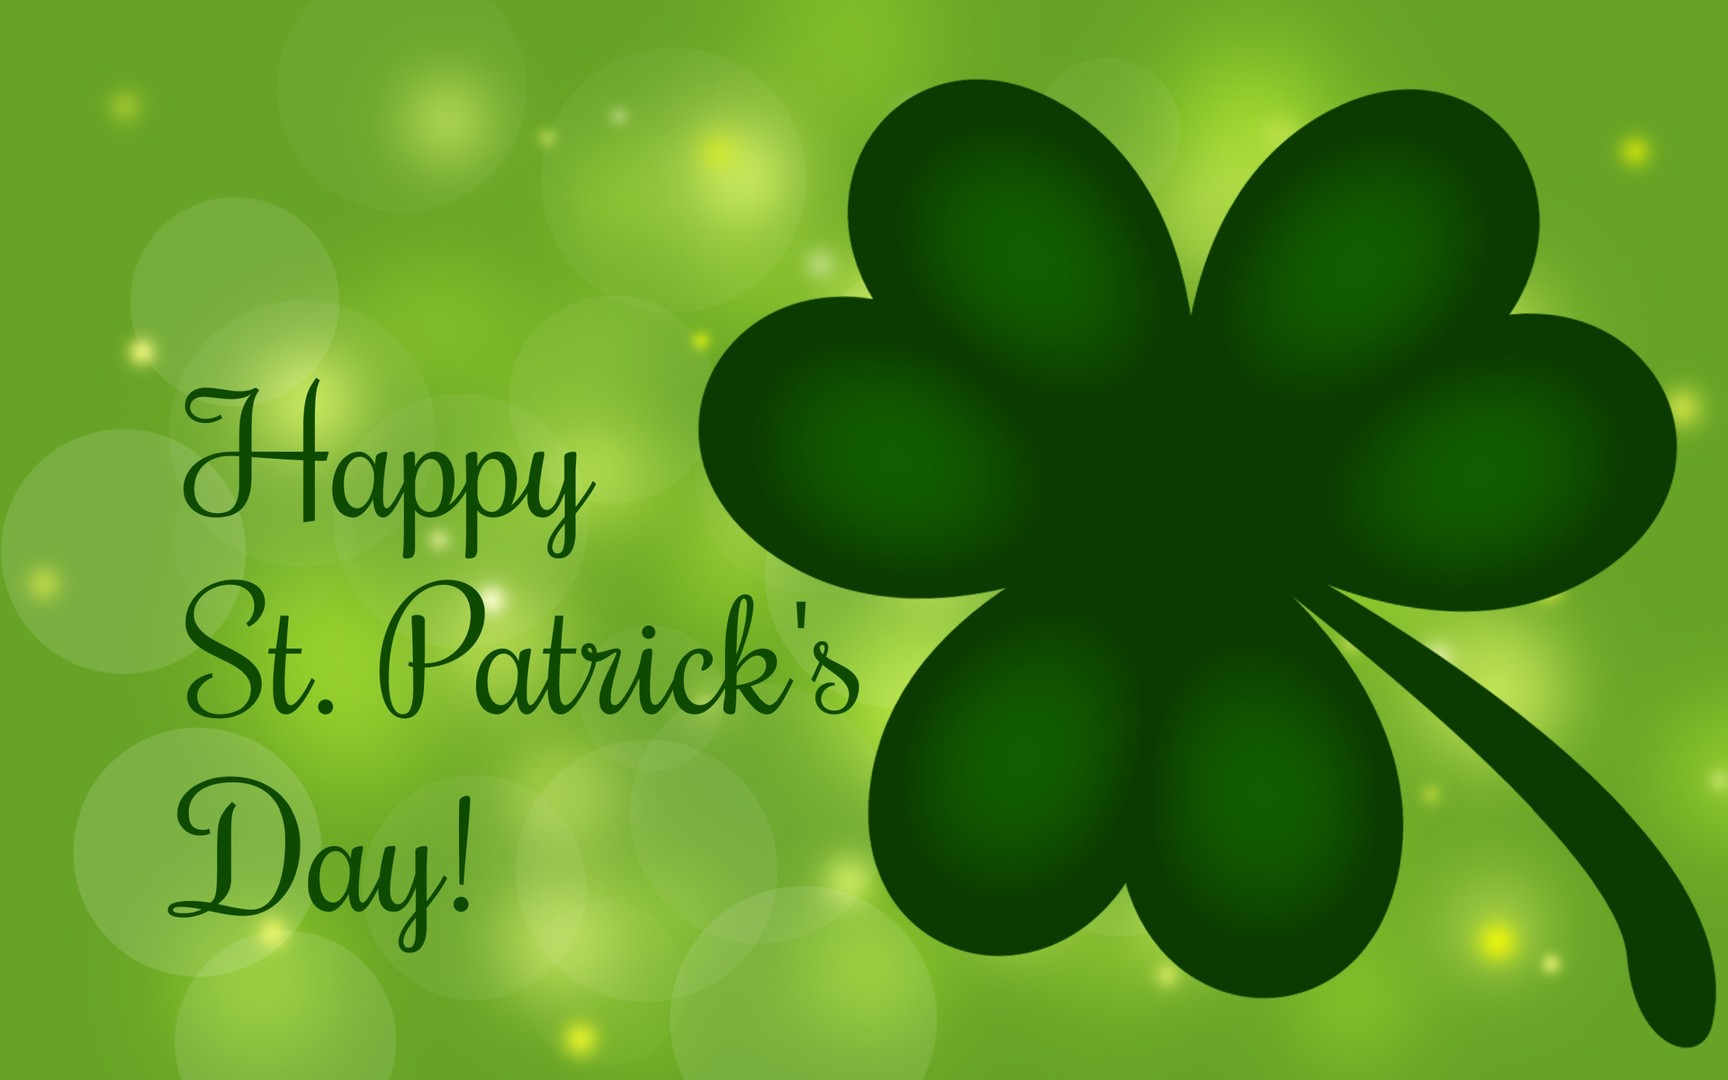 Happy Saint Patrick's Day! wallpaper #19717